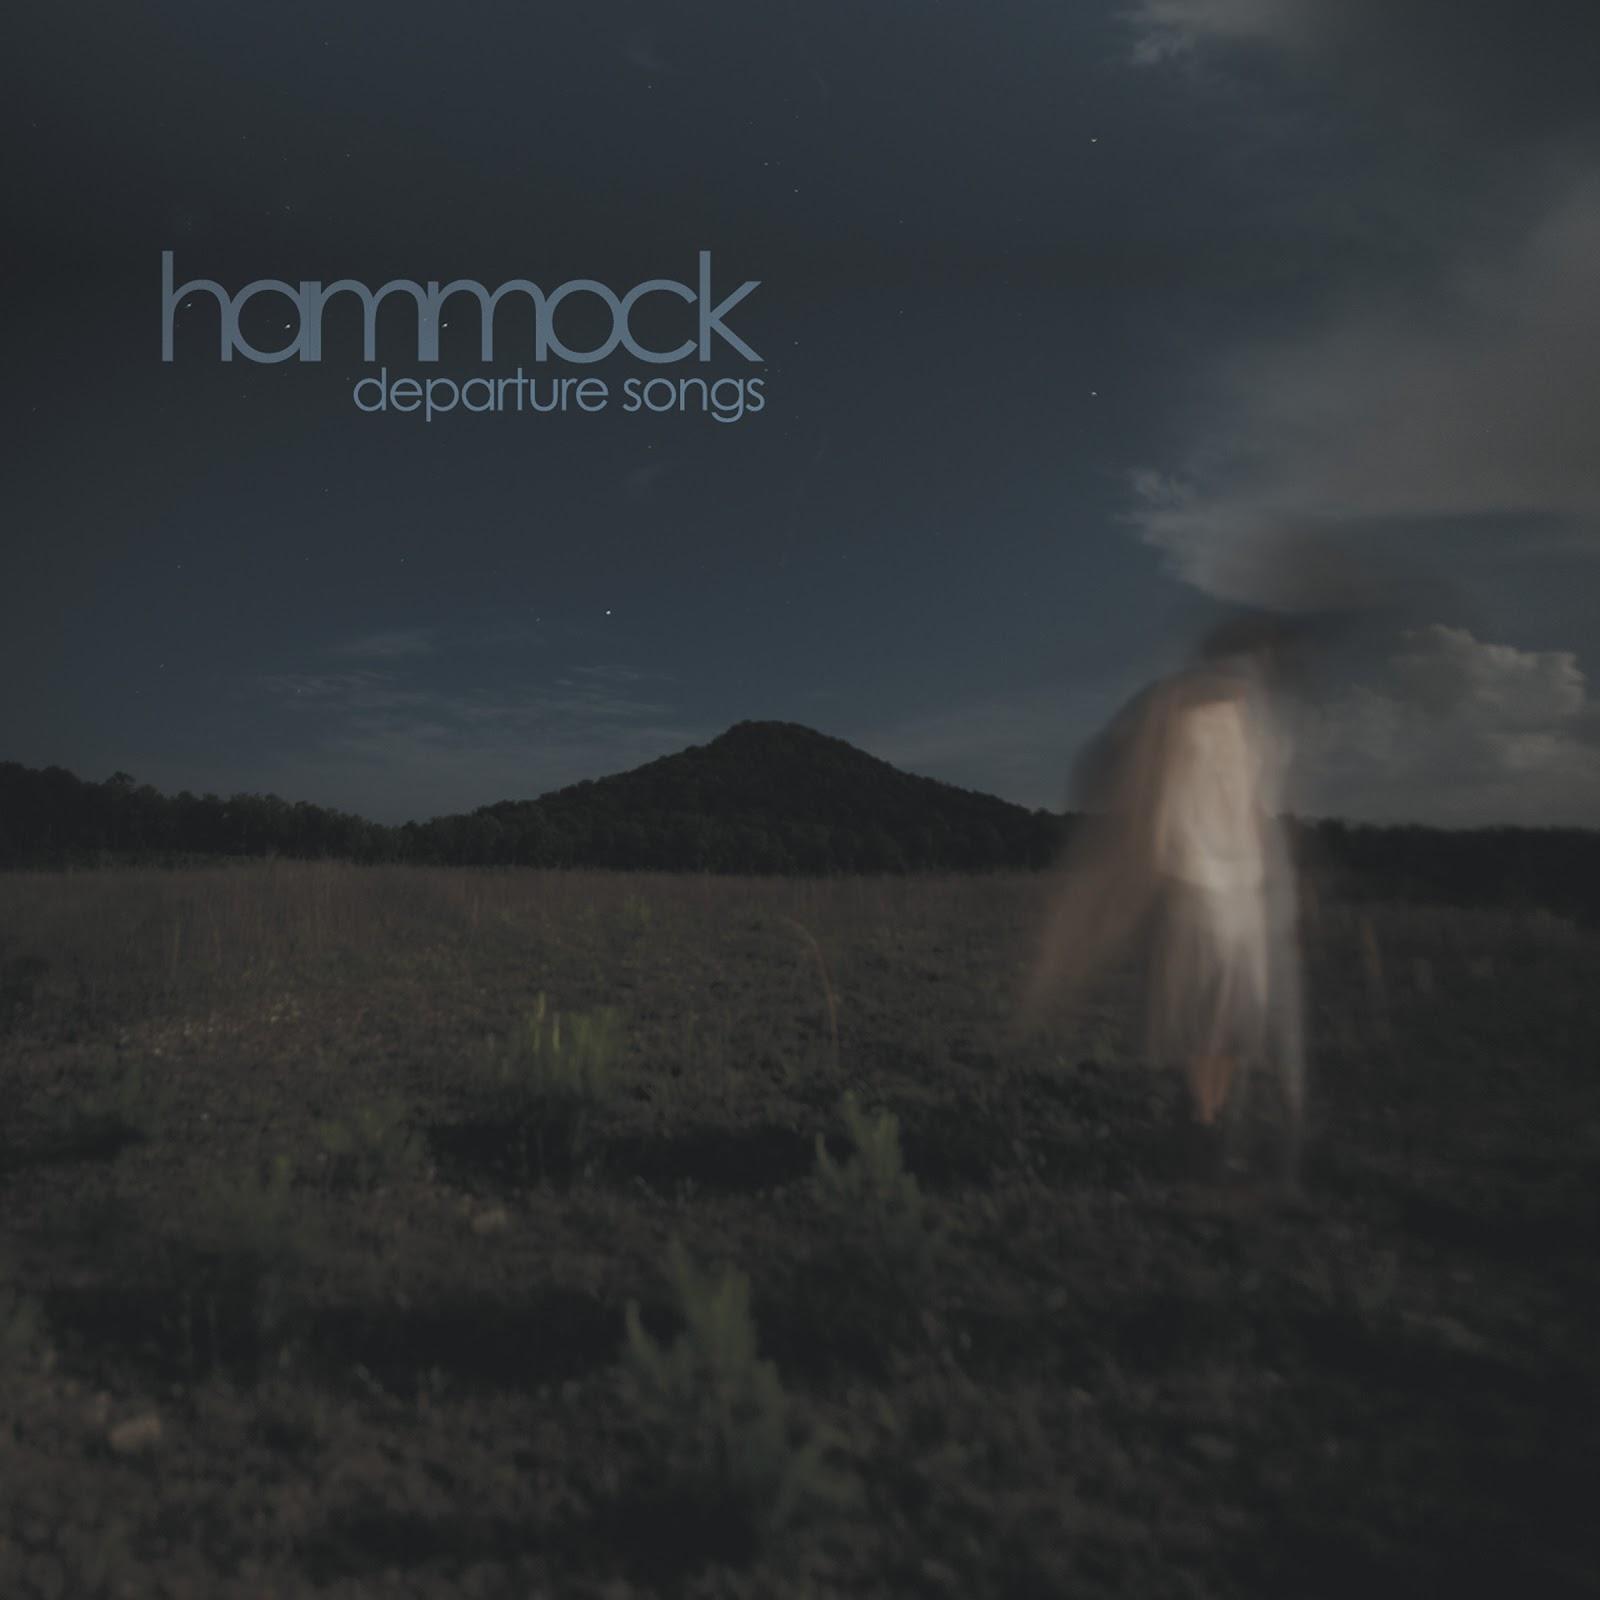 hammock   departure songs   2012 hammock   departure songs   2012   something for the ghosts  rh   somethingfortheghosts blogspot